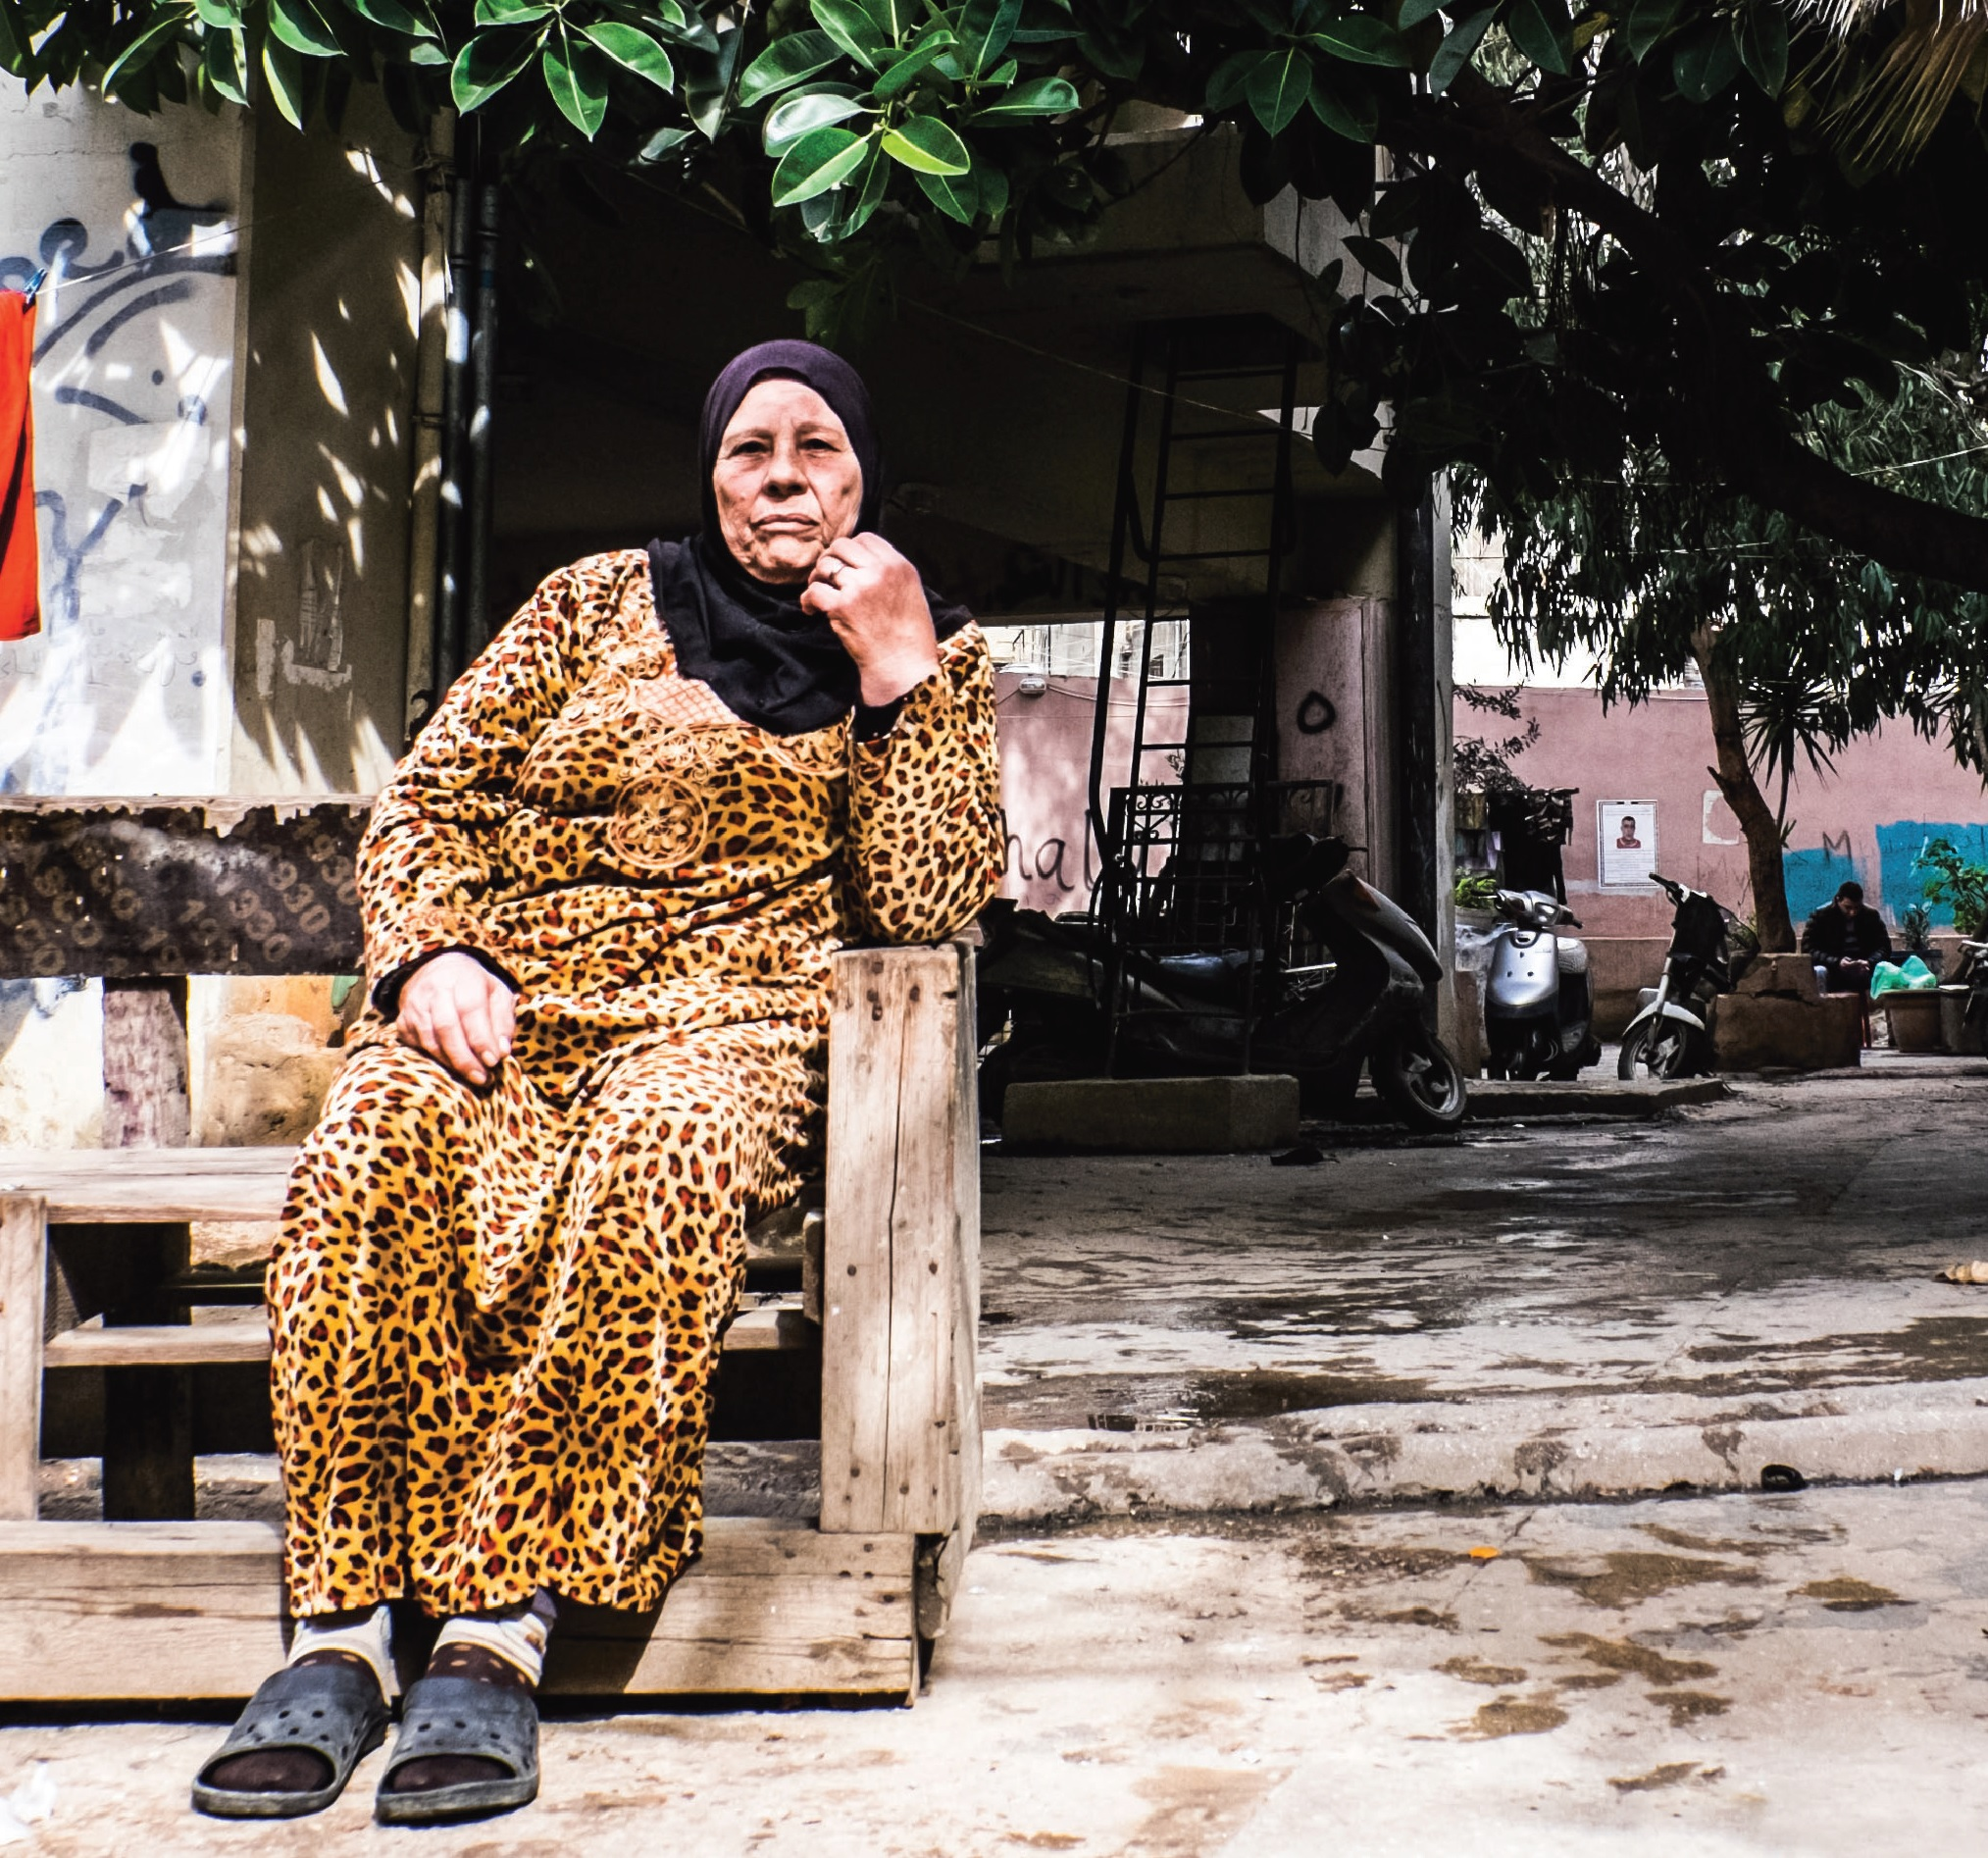 © 2016 UNRWA Photo by Francesco Romagnolo